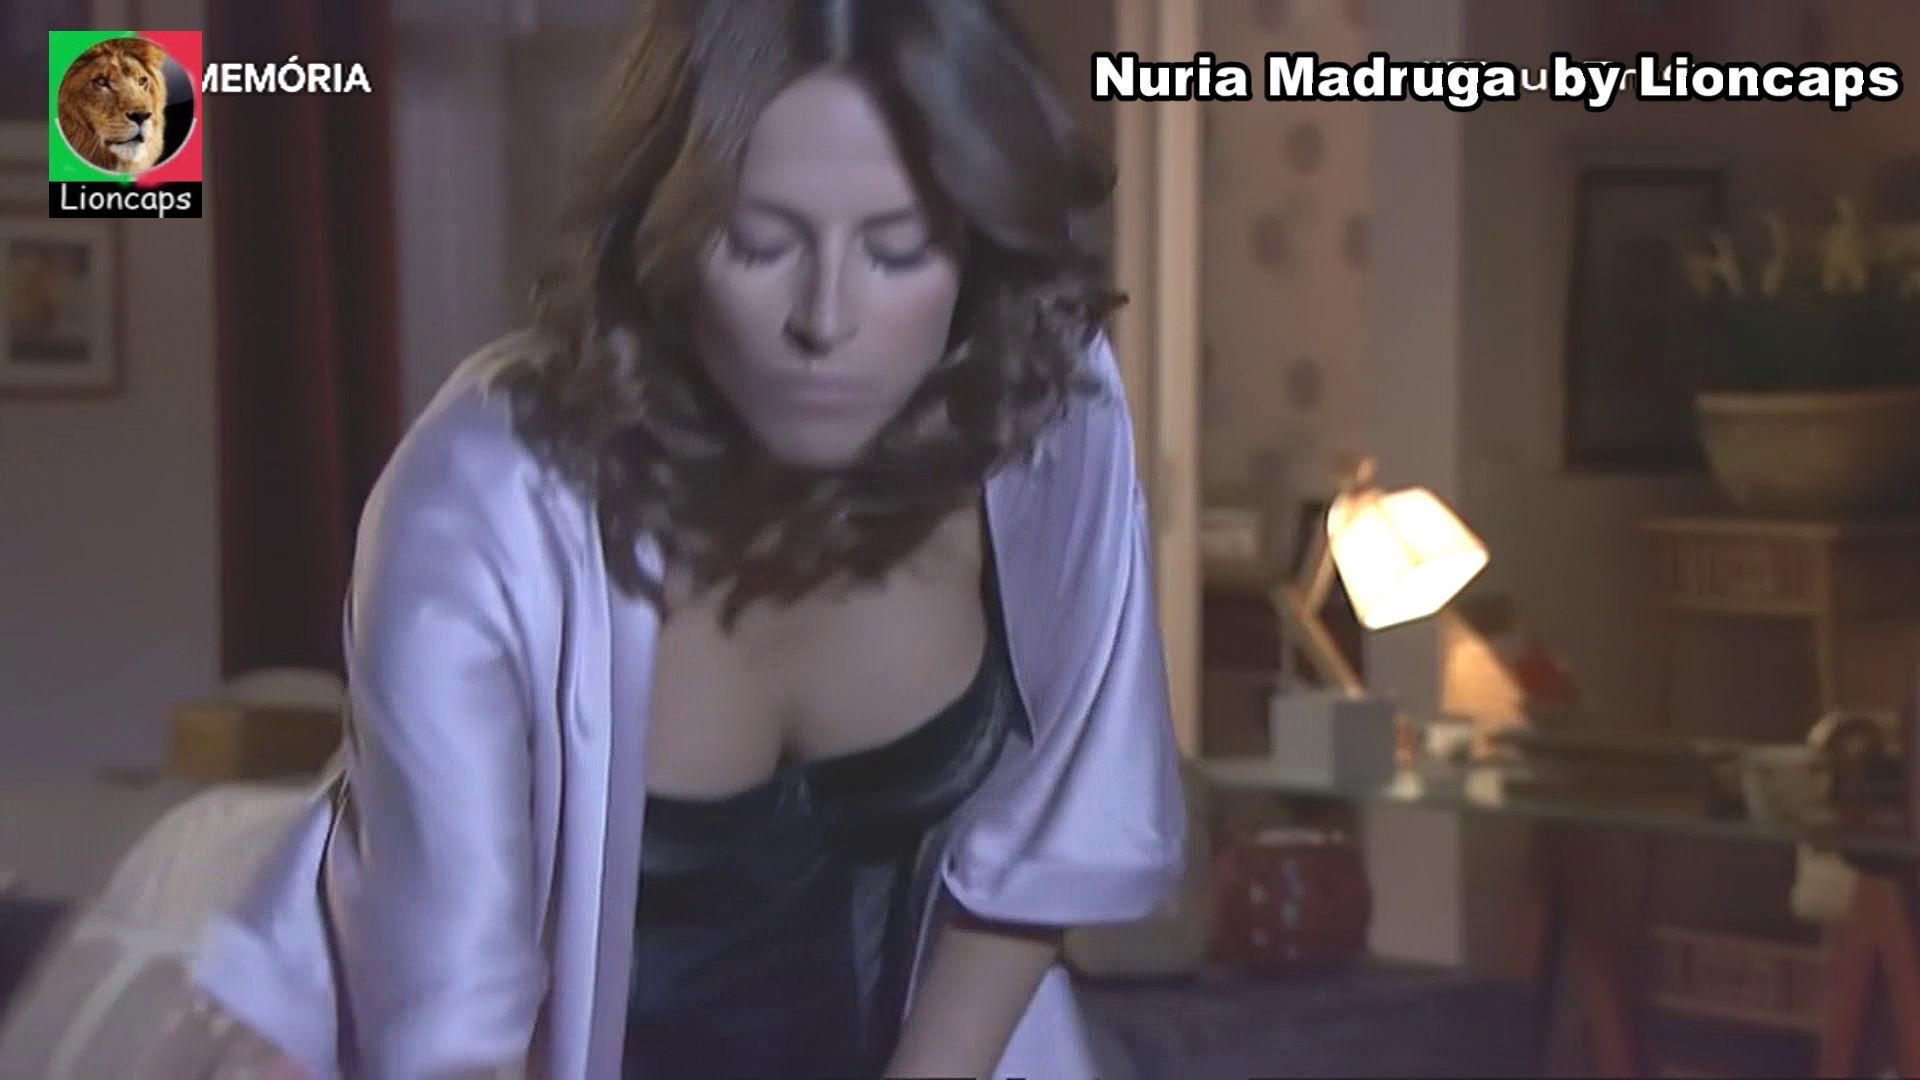 nuria_madruga_vs200421-001 (8).JPG